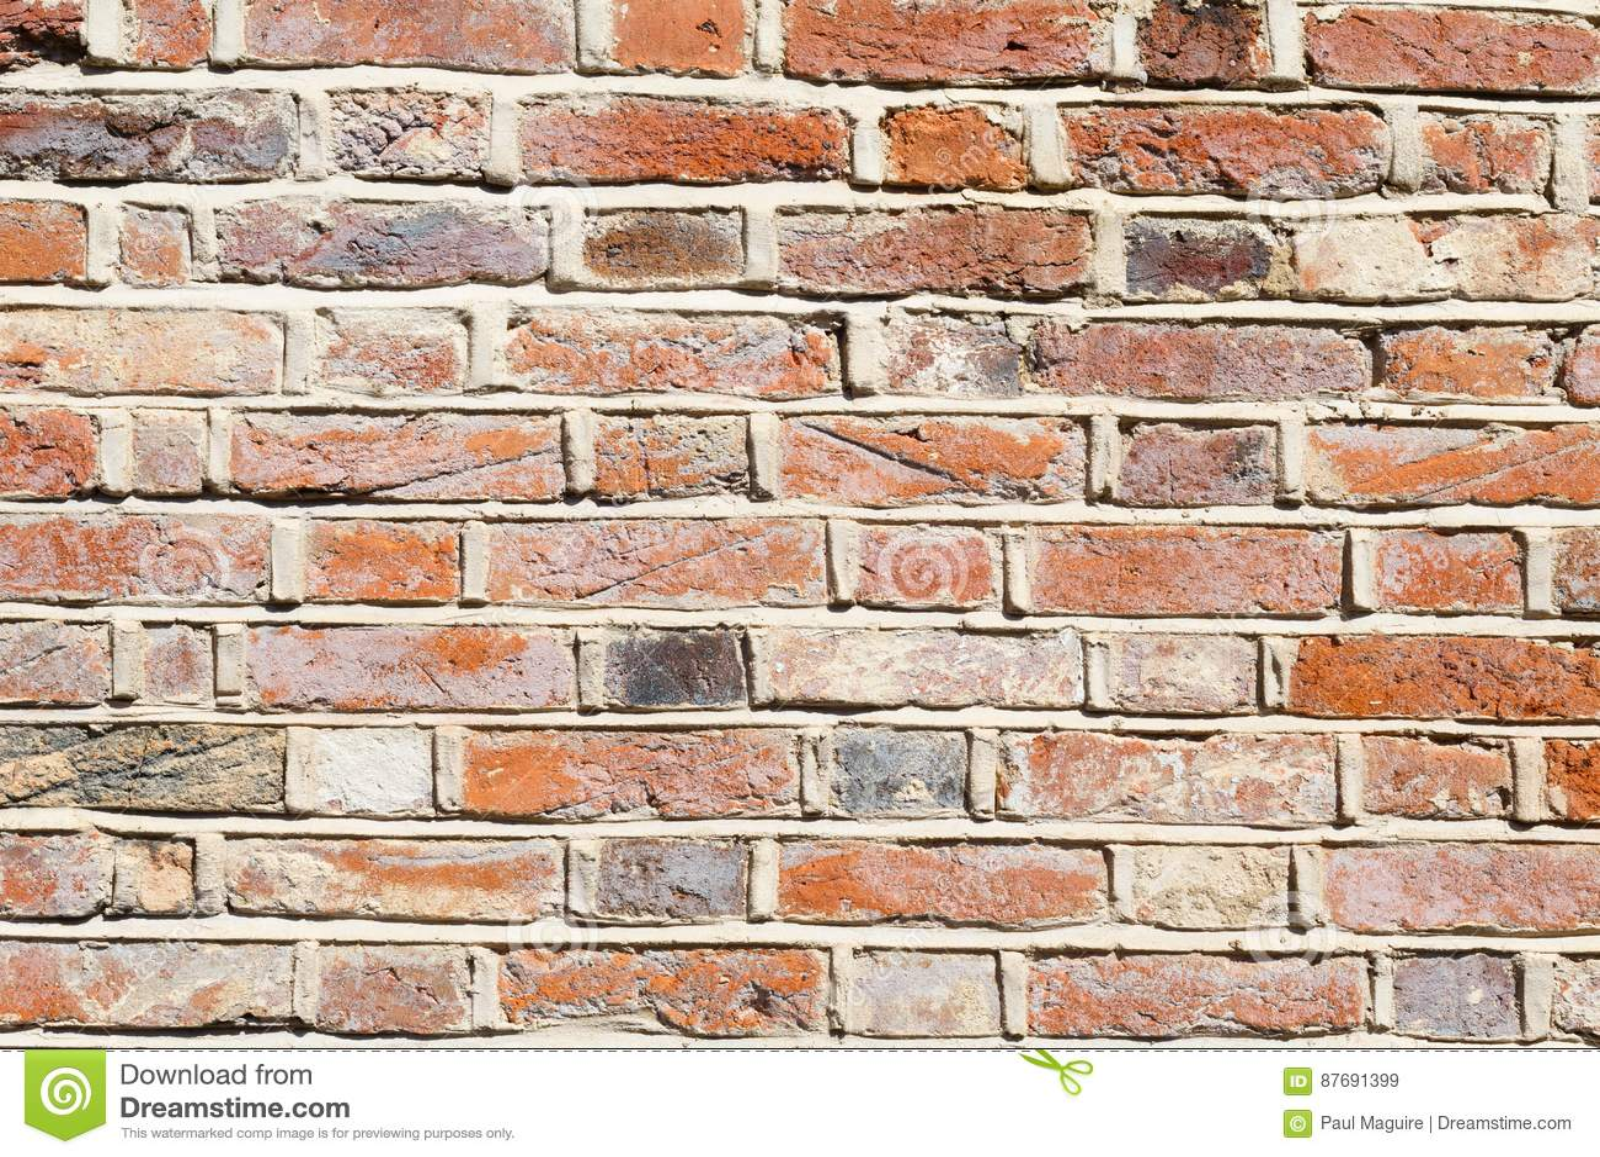 Lime Brick On Image : Lime mortar brick wall background stock image